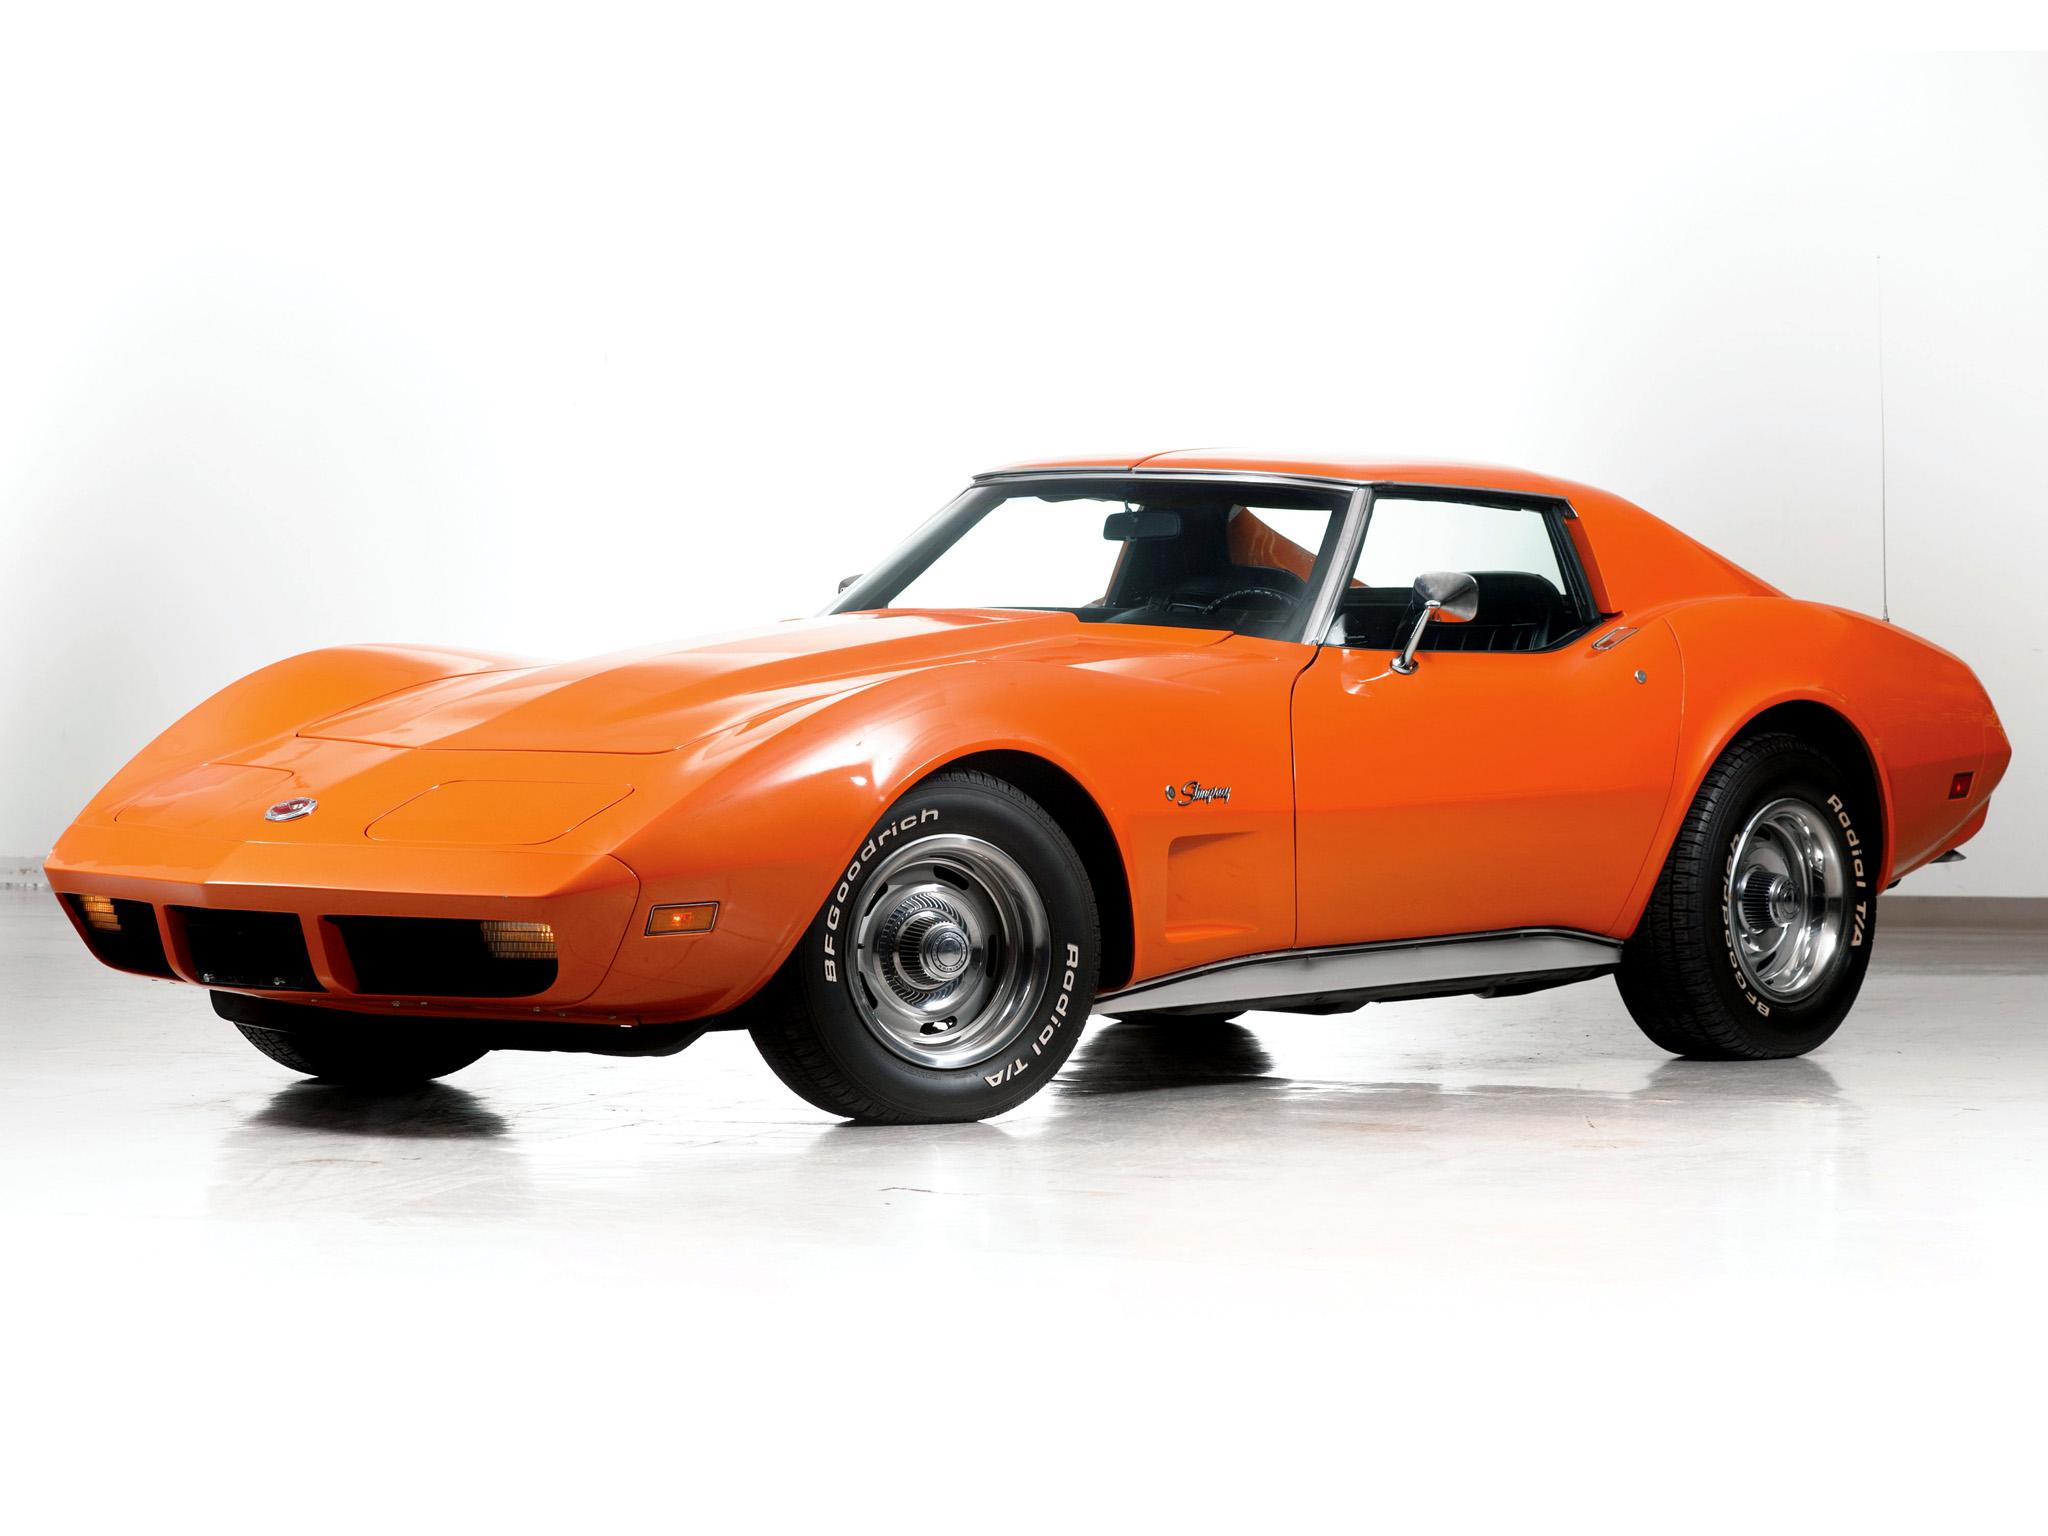 1974 Chevrolet Corvette Stingray C 3 Supercar Muscle